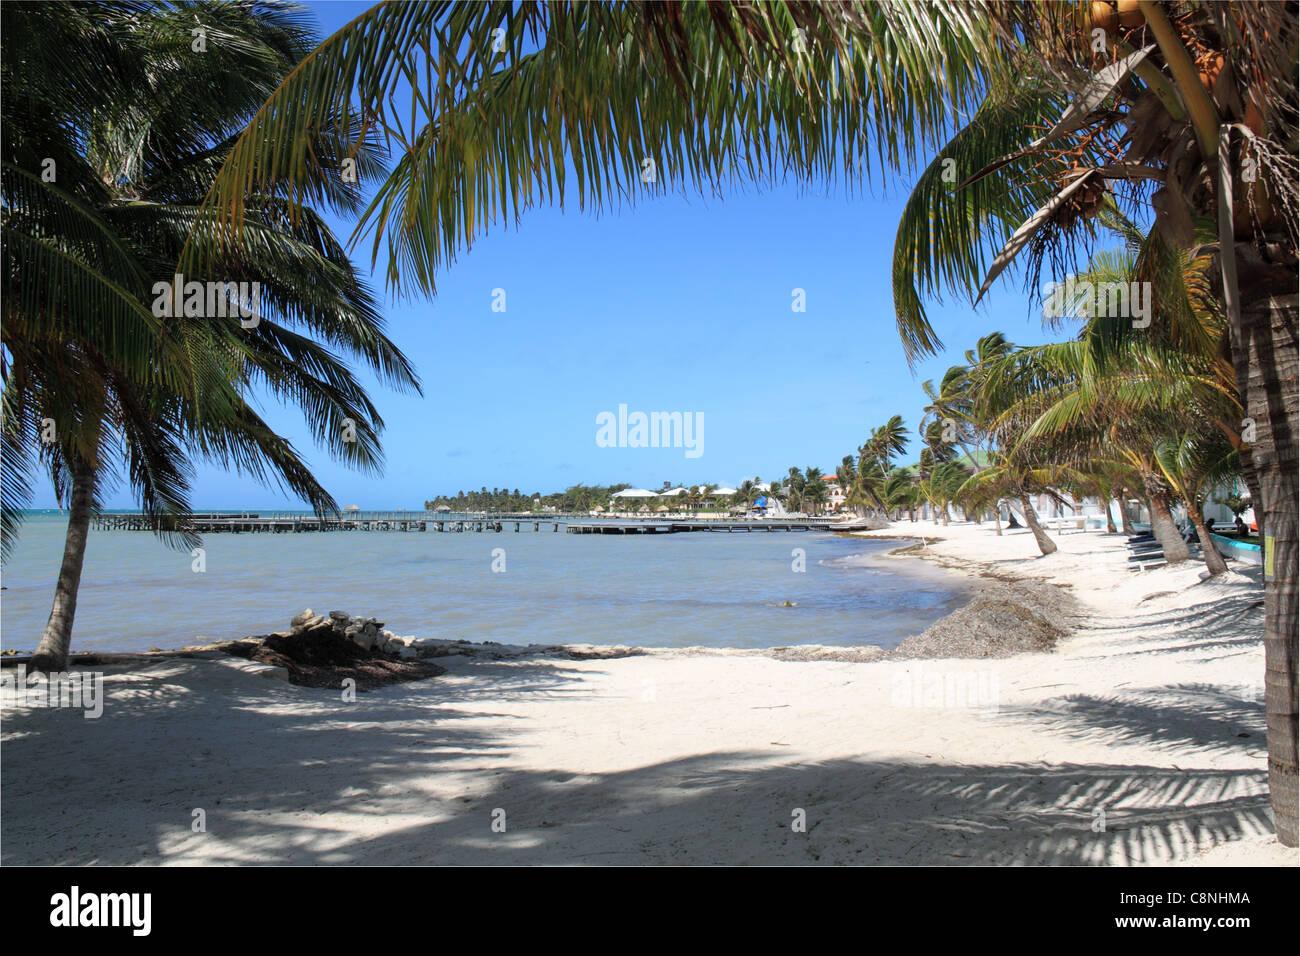 Banyan Bay Villas, San Pedro, Ambergris Caye (aka La Isla Bonita/The Beautiful Island), Barrier Reef, Belize, Caribbean, - Stock Image